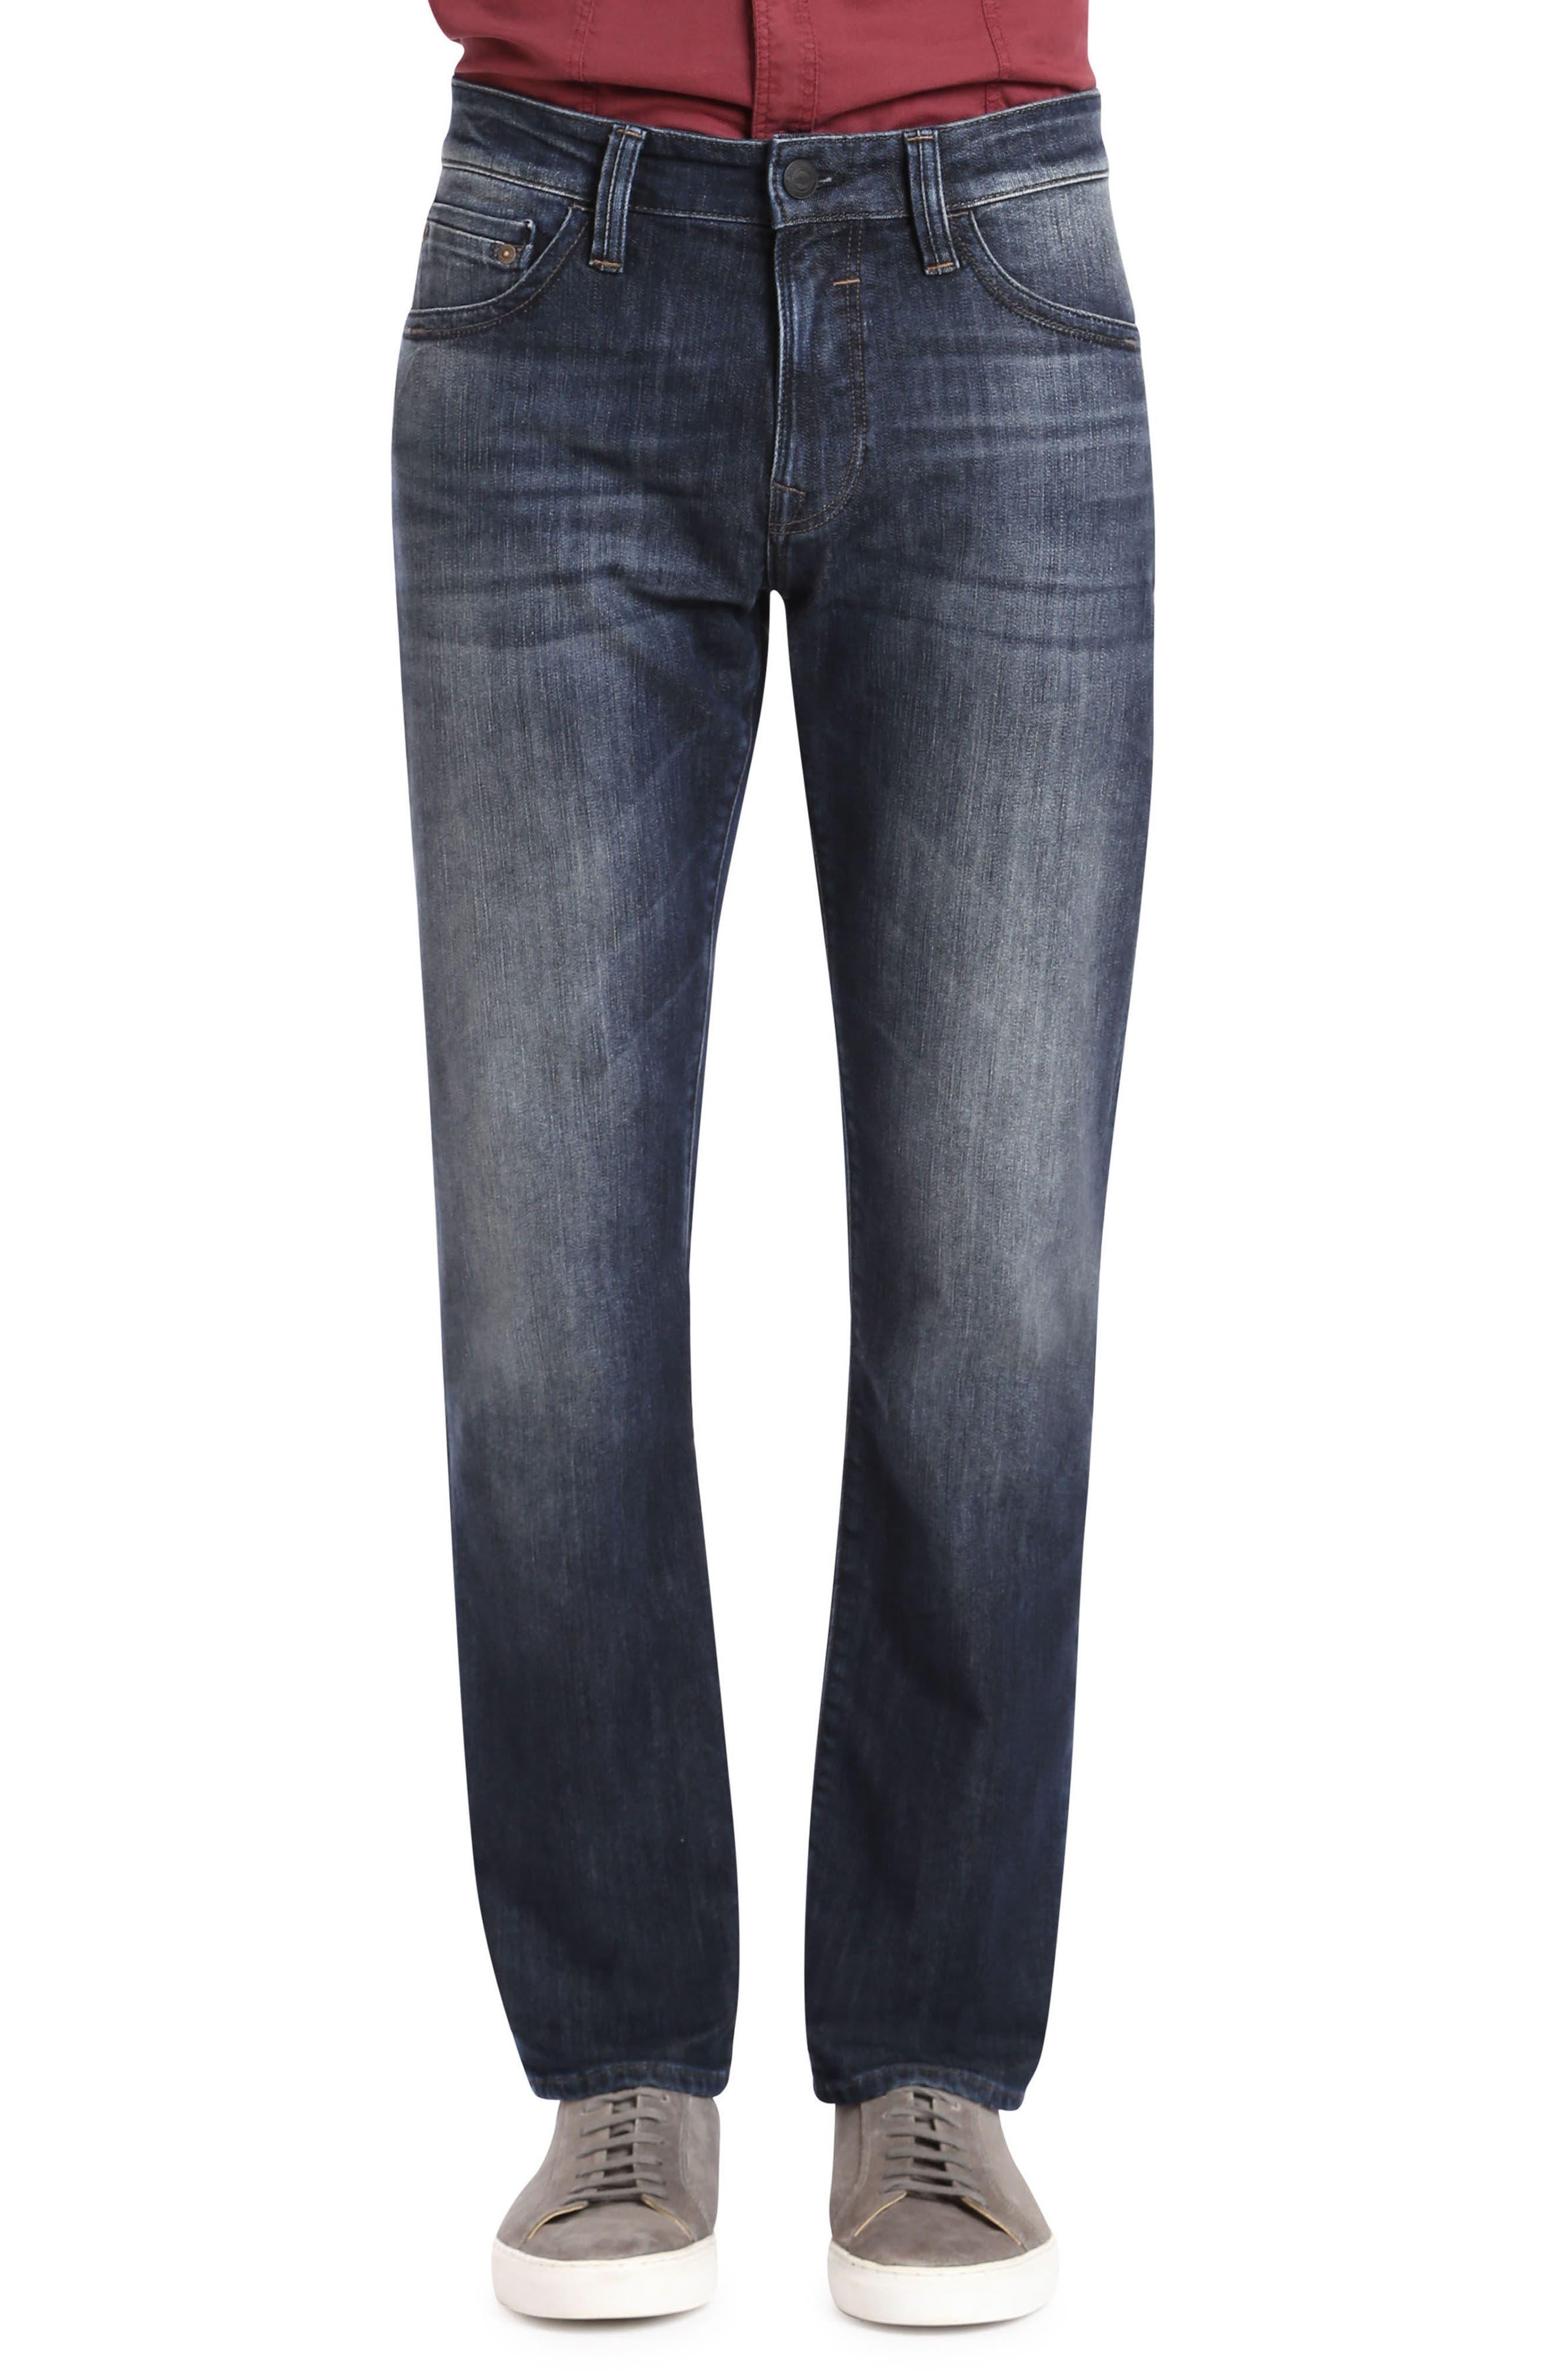 Mavi Jeans Zach Straight Leg Jeans (Deep Shaded New York)